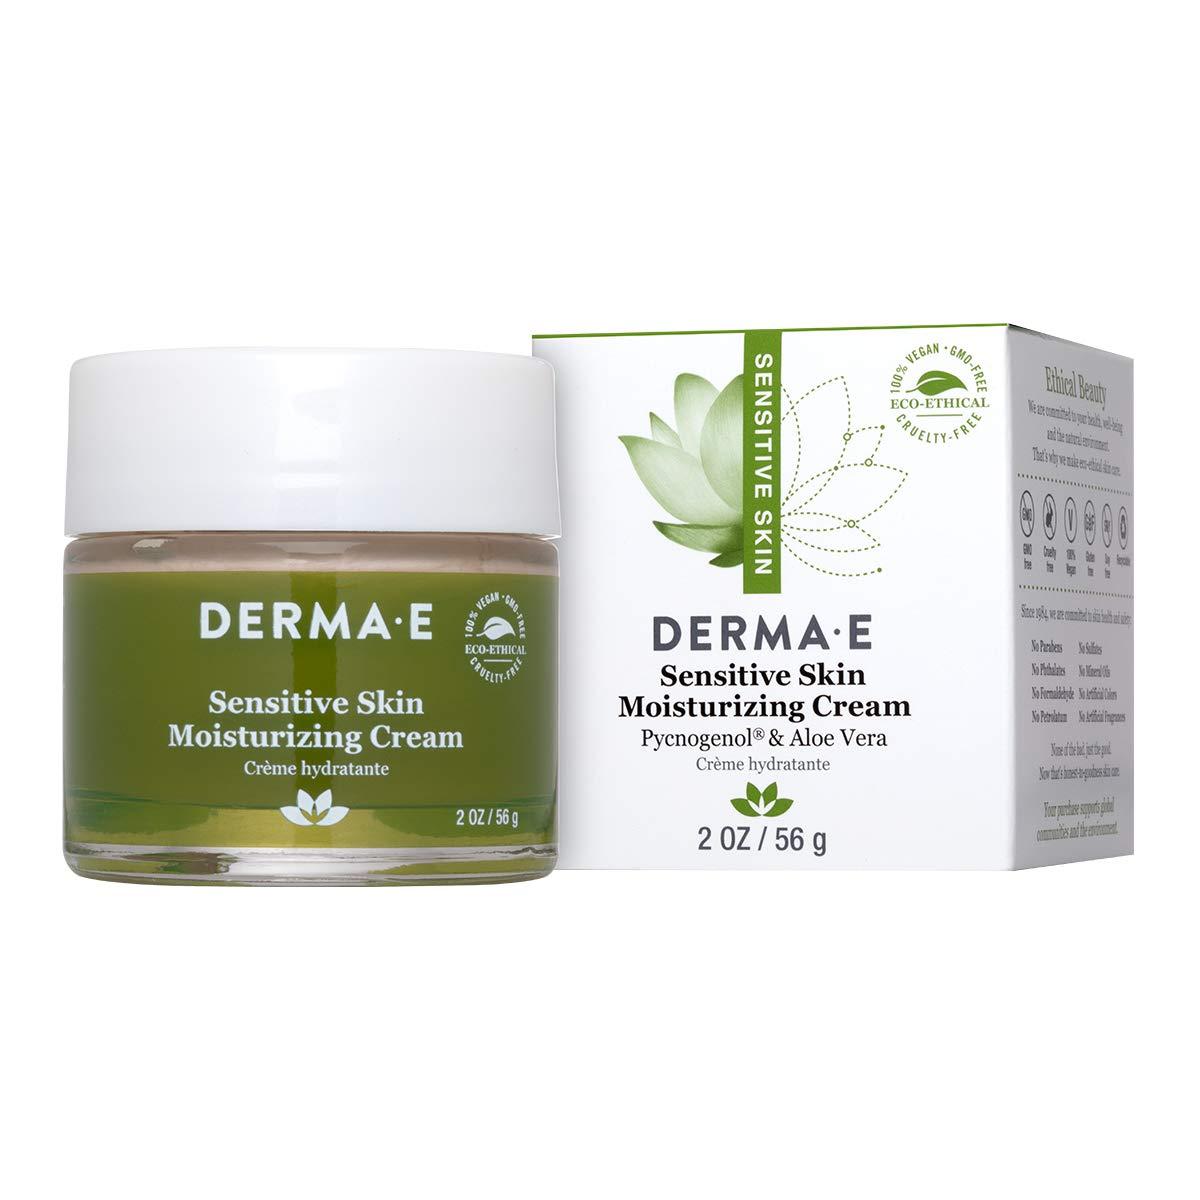 DERMA E Sensitive Skin Moisturizing Cream with Pycnogenol Vitamins A, C and E 2oz by DERMA-E